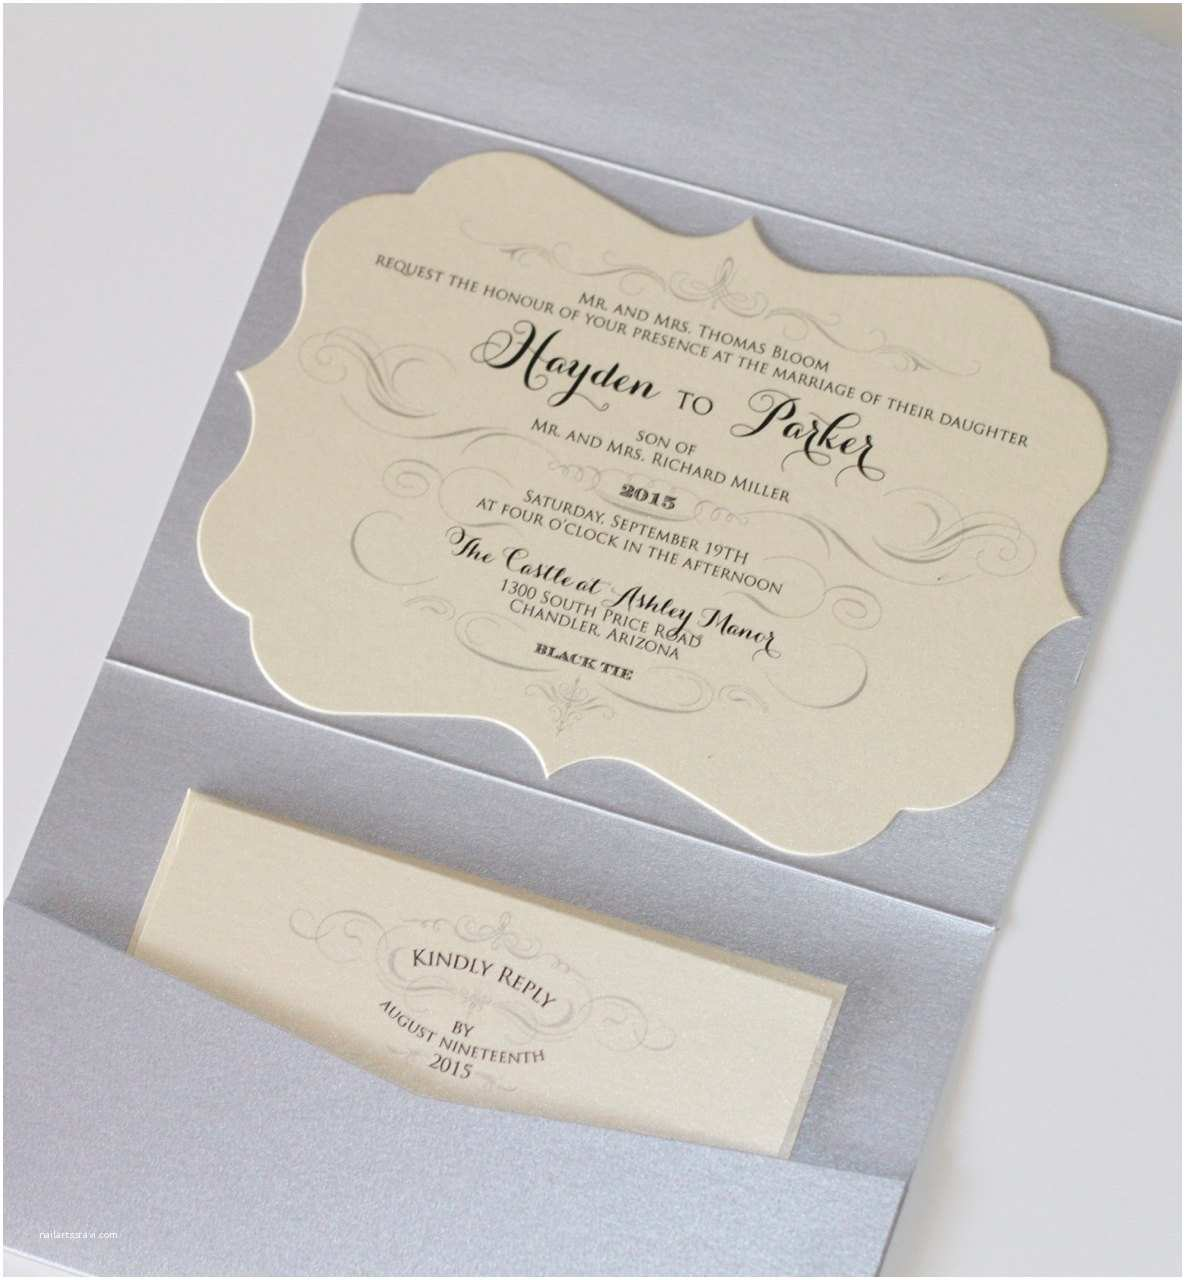 hayden cut frame horizontal pocket fold wedding invitation sample ivory champagne silver glitter